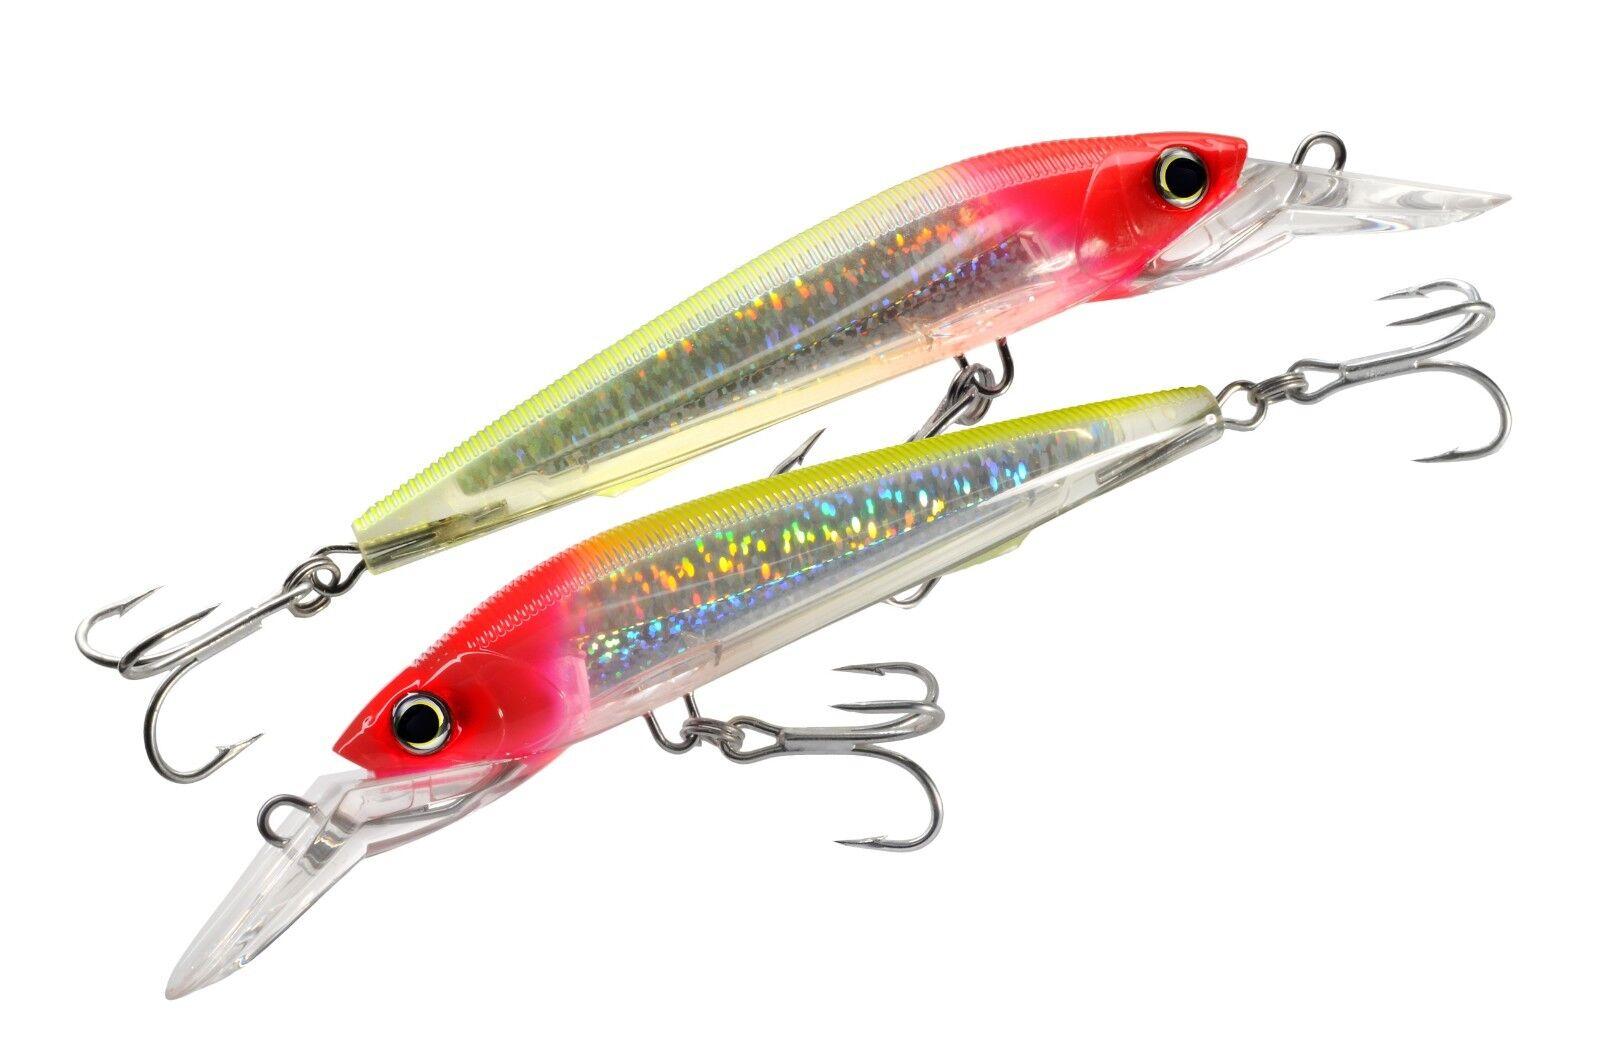 Yo-Zuri 3D Magnum 7 inch Sinking Trolling Lure Tuna /& Wahoo Fishing Lure